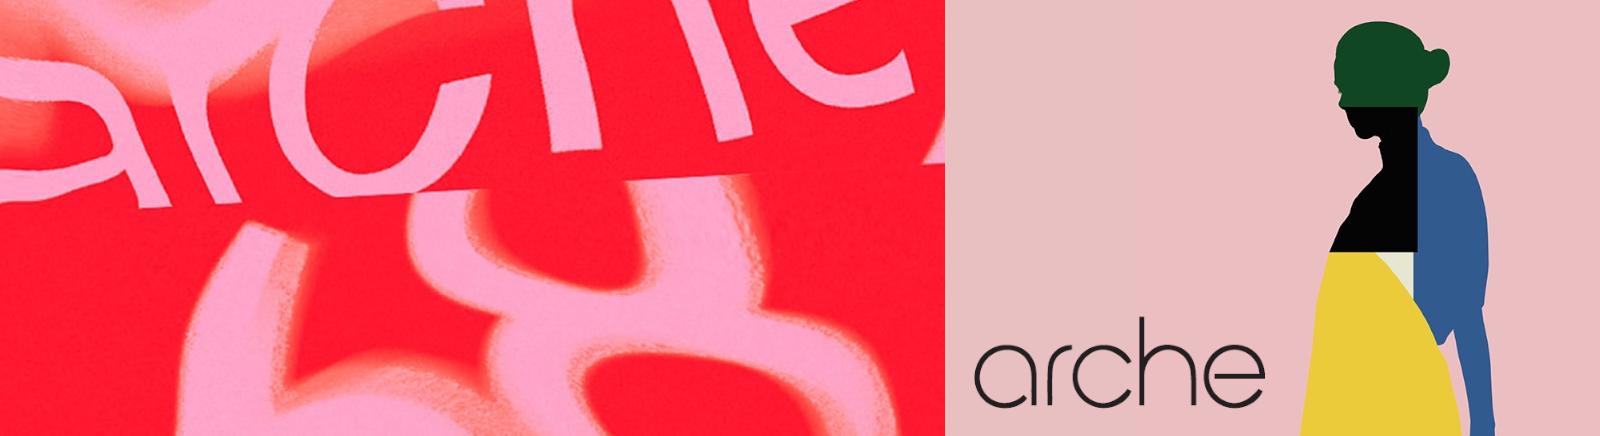 Prange: Arche Damenschuhe online shoppen